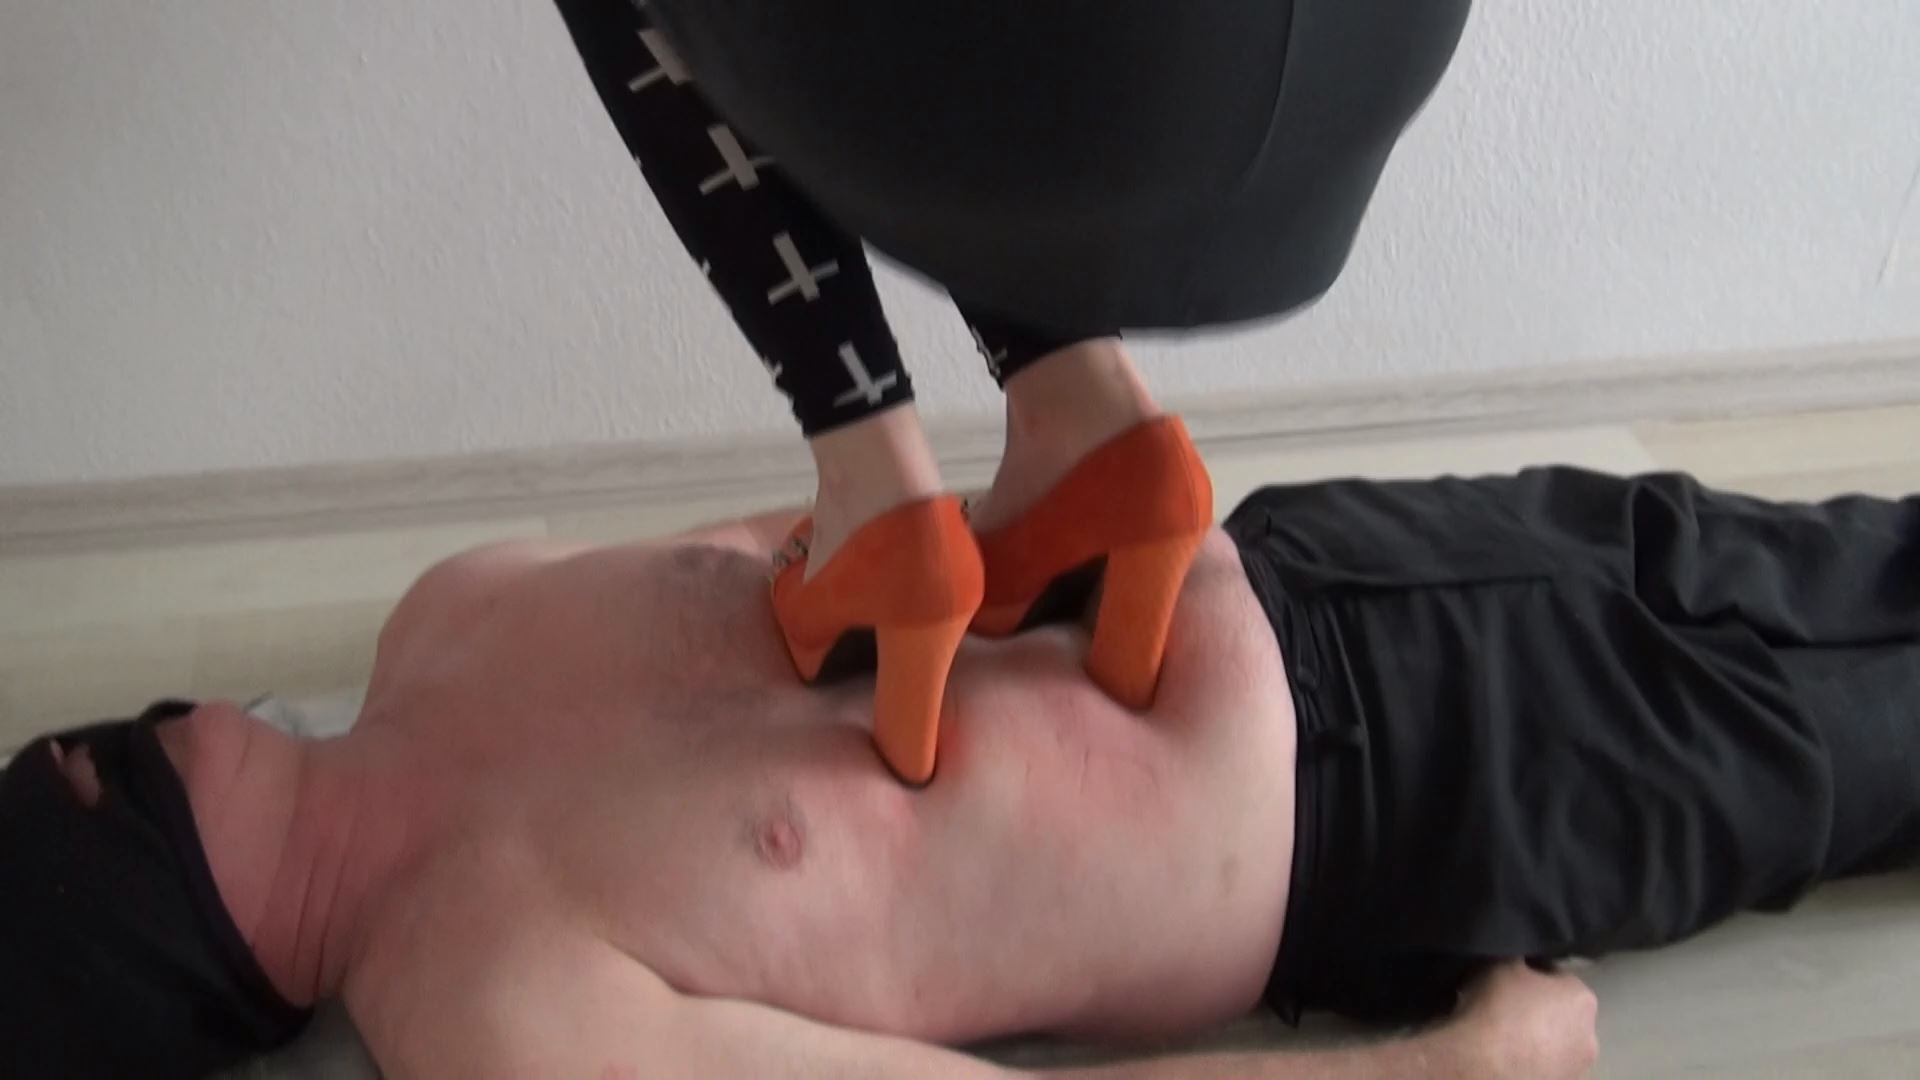 Lucy trampling in high heels - ABBIECATFETISH - FULL HD/1080p/MP4